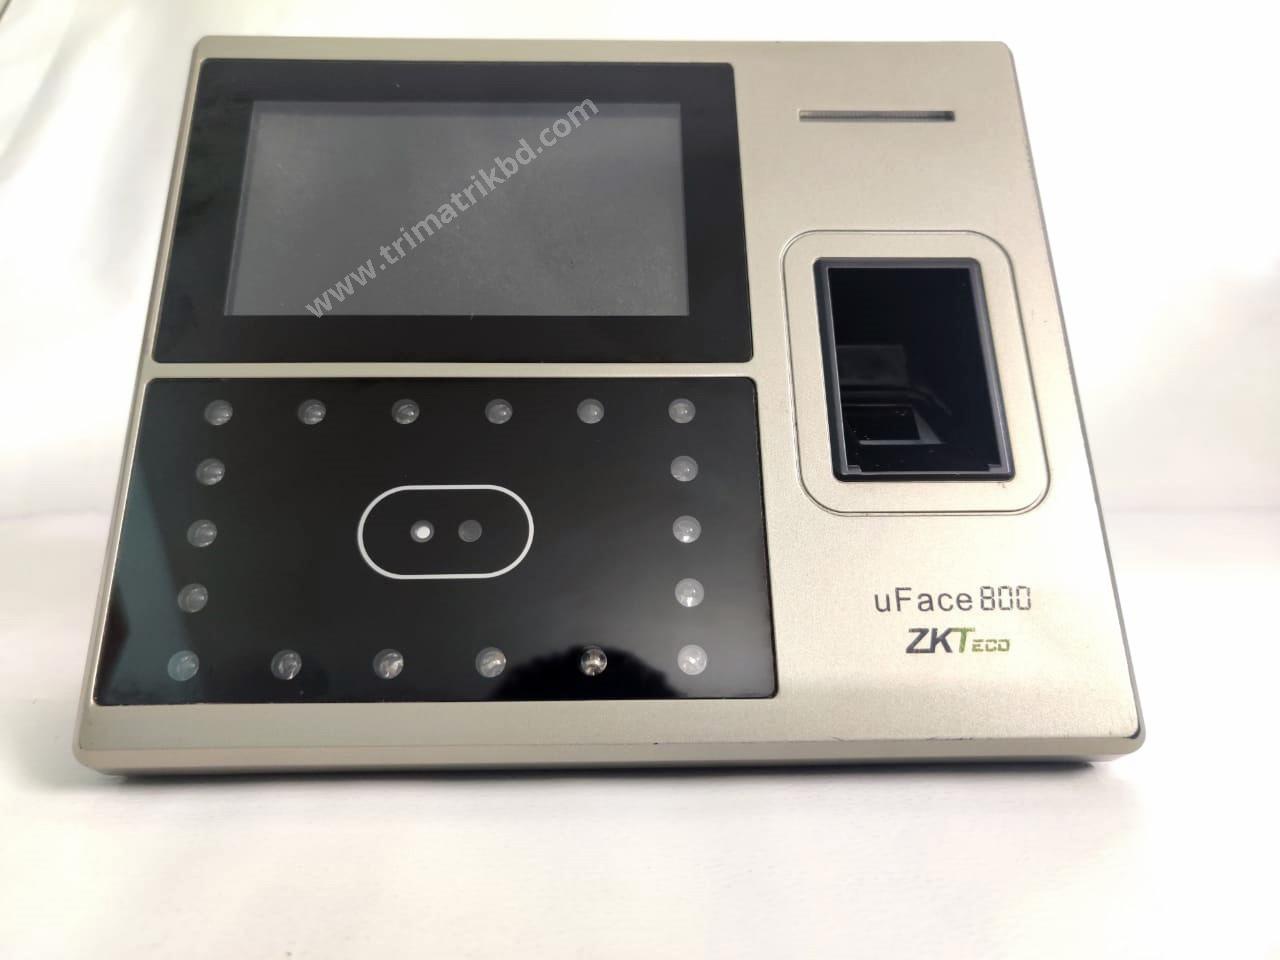 Zkteco uface800 price in bangladesh (1)